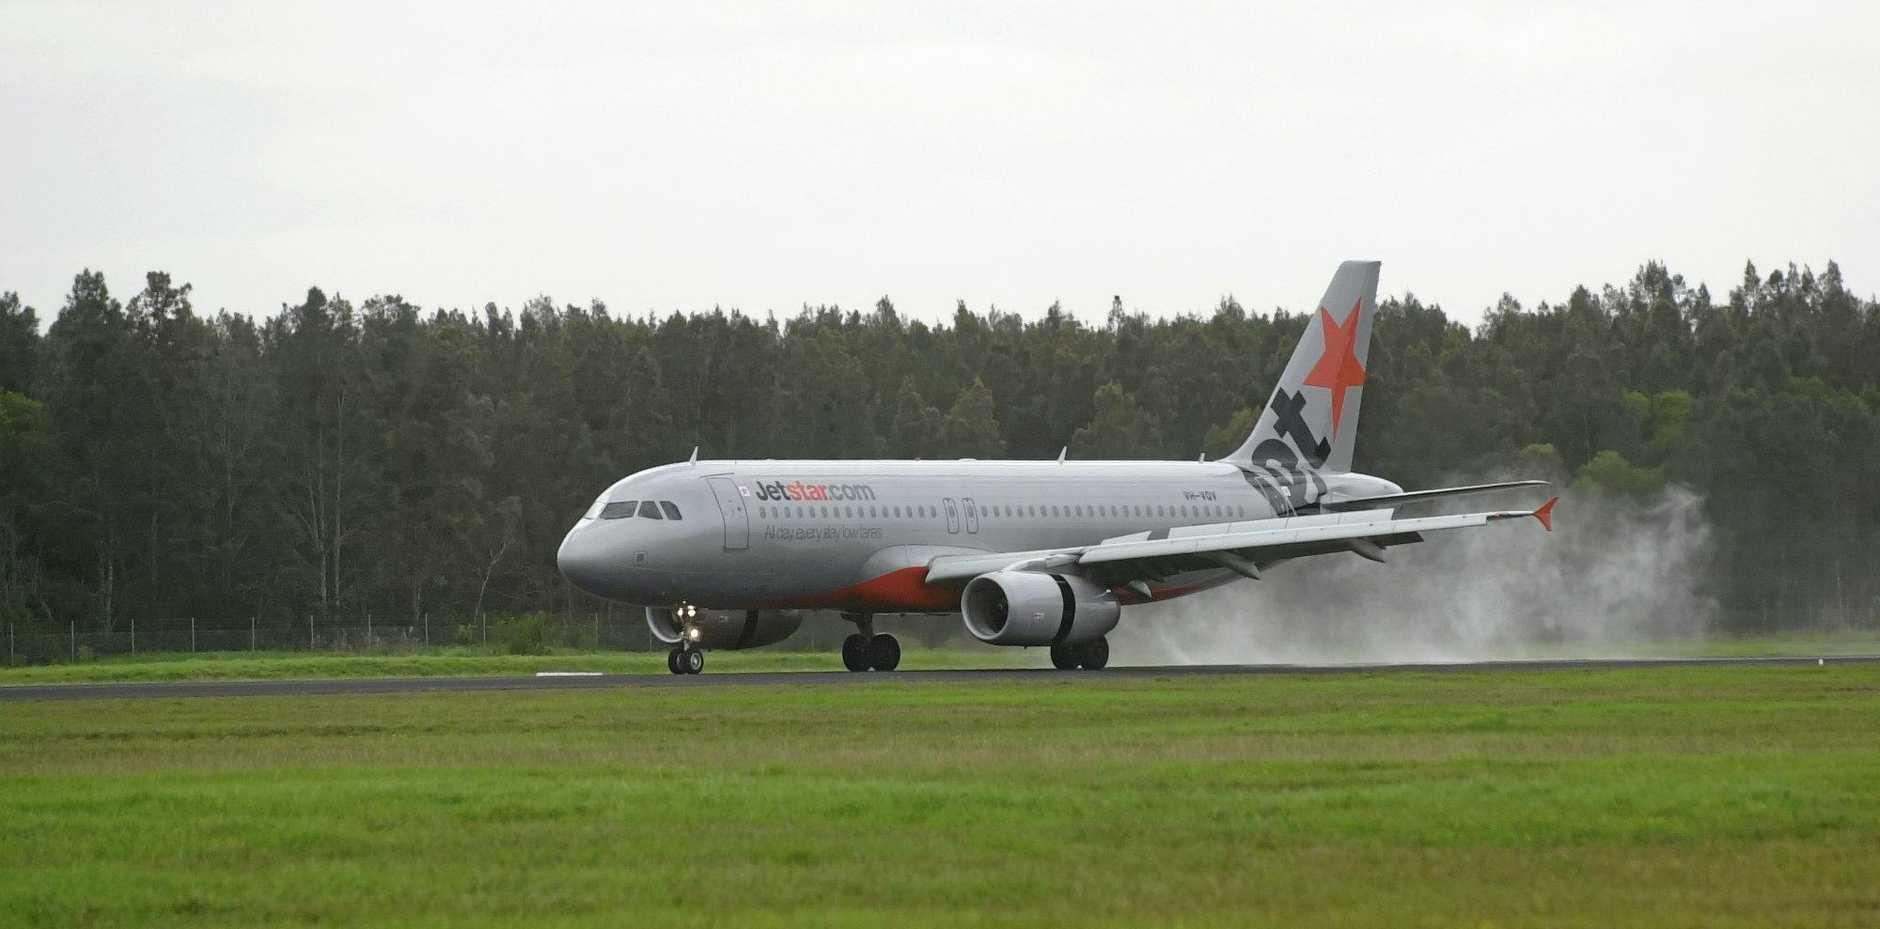 Cancelled Jetstar flight delays passengers seven hours ...